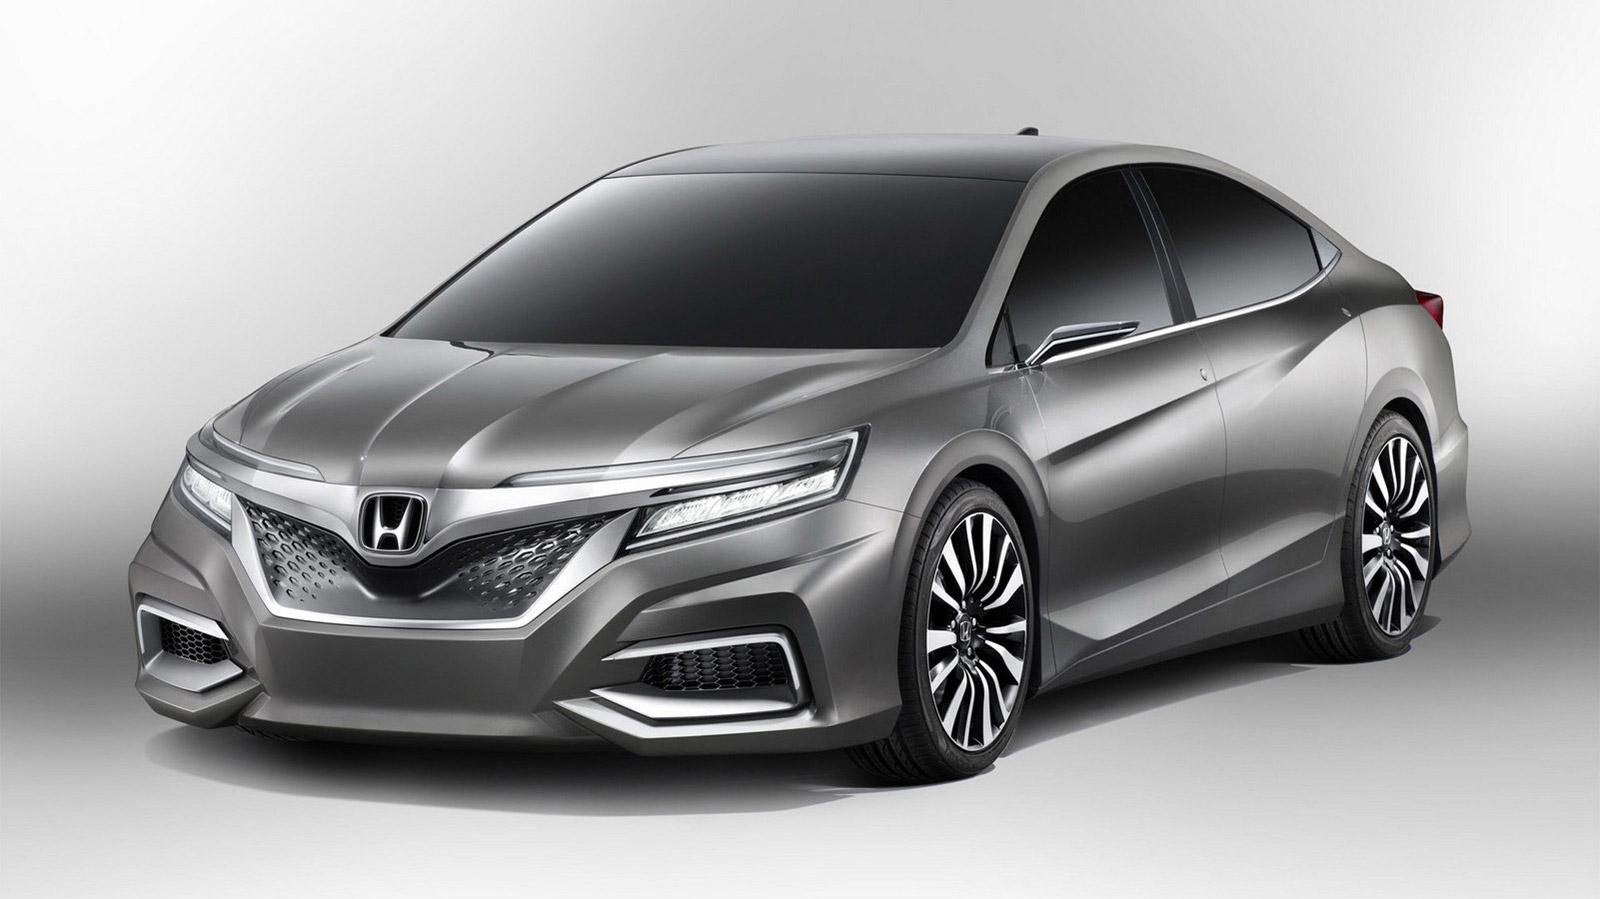 Acura 2012 Tlx